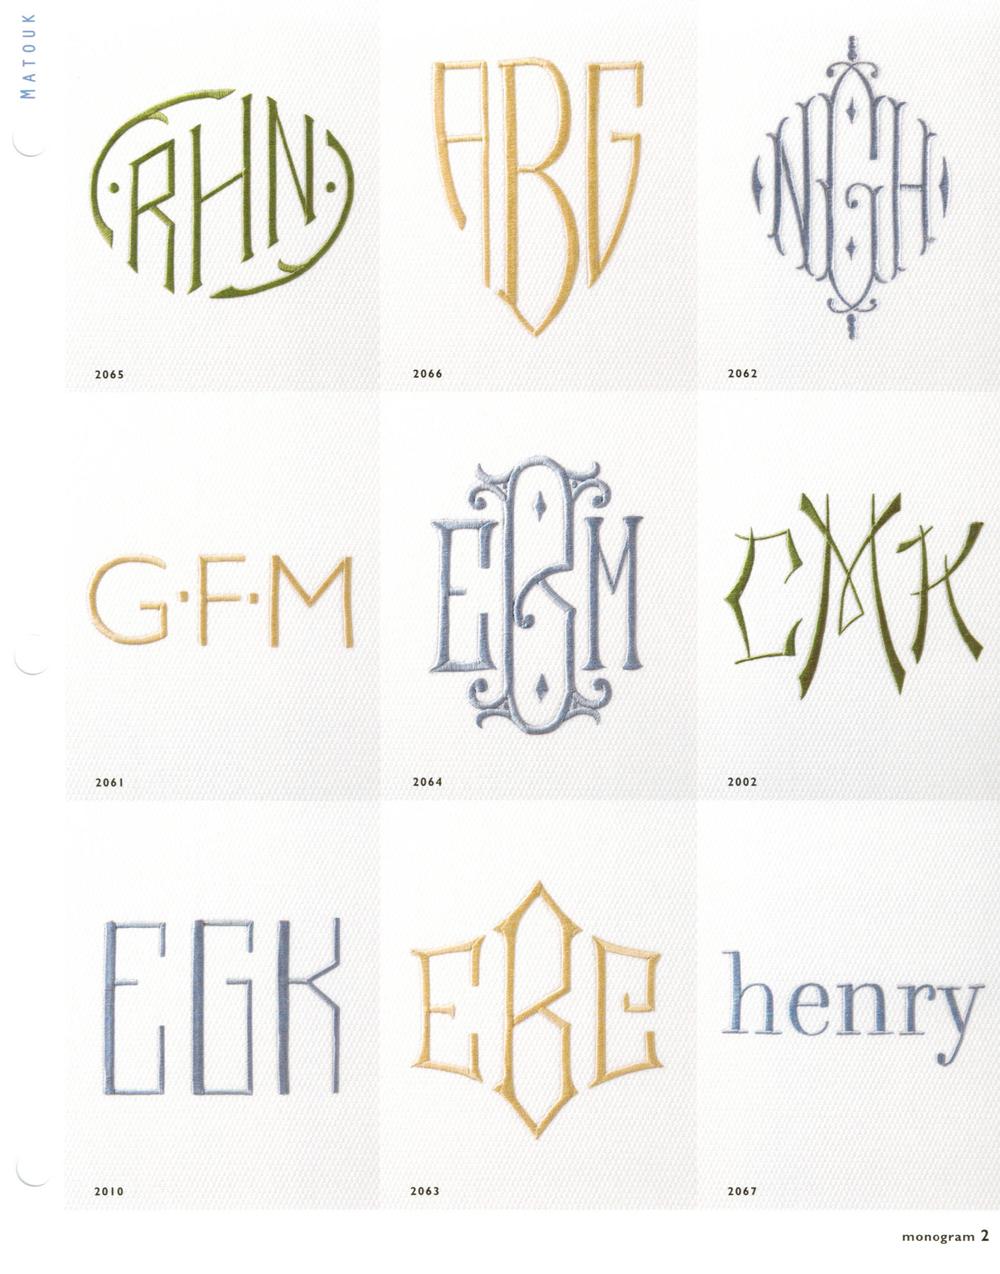 Matouk Monogram Styles